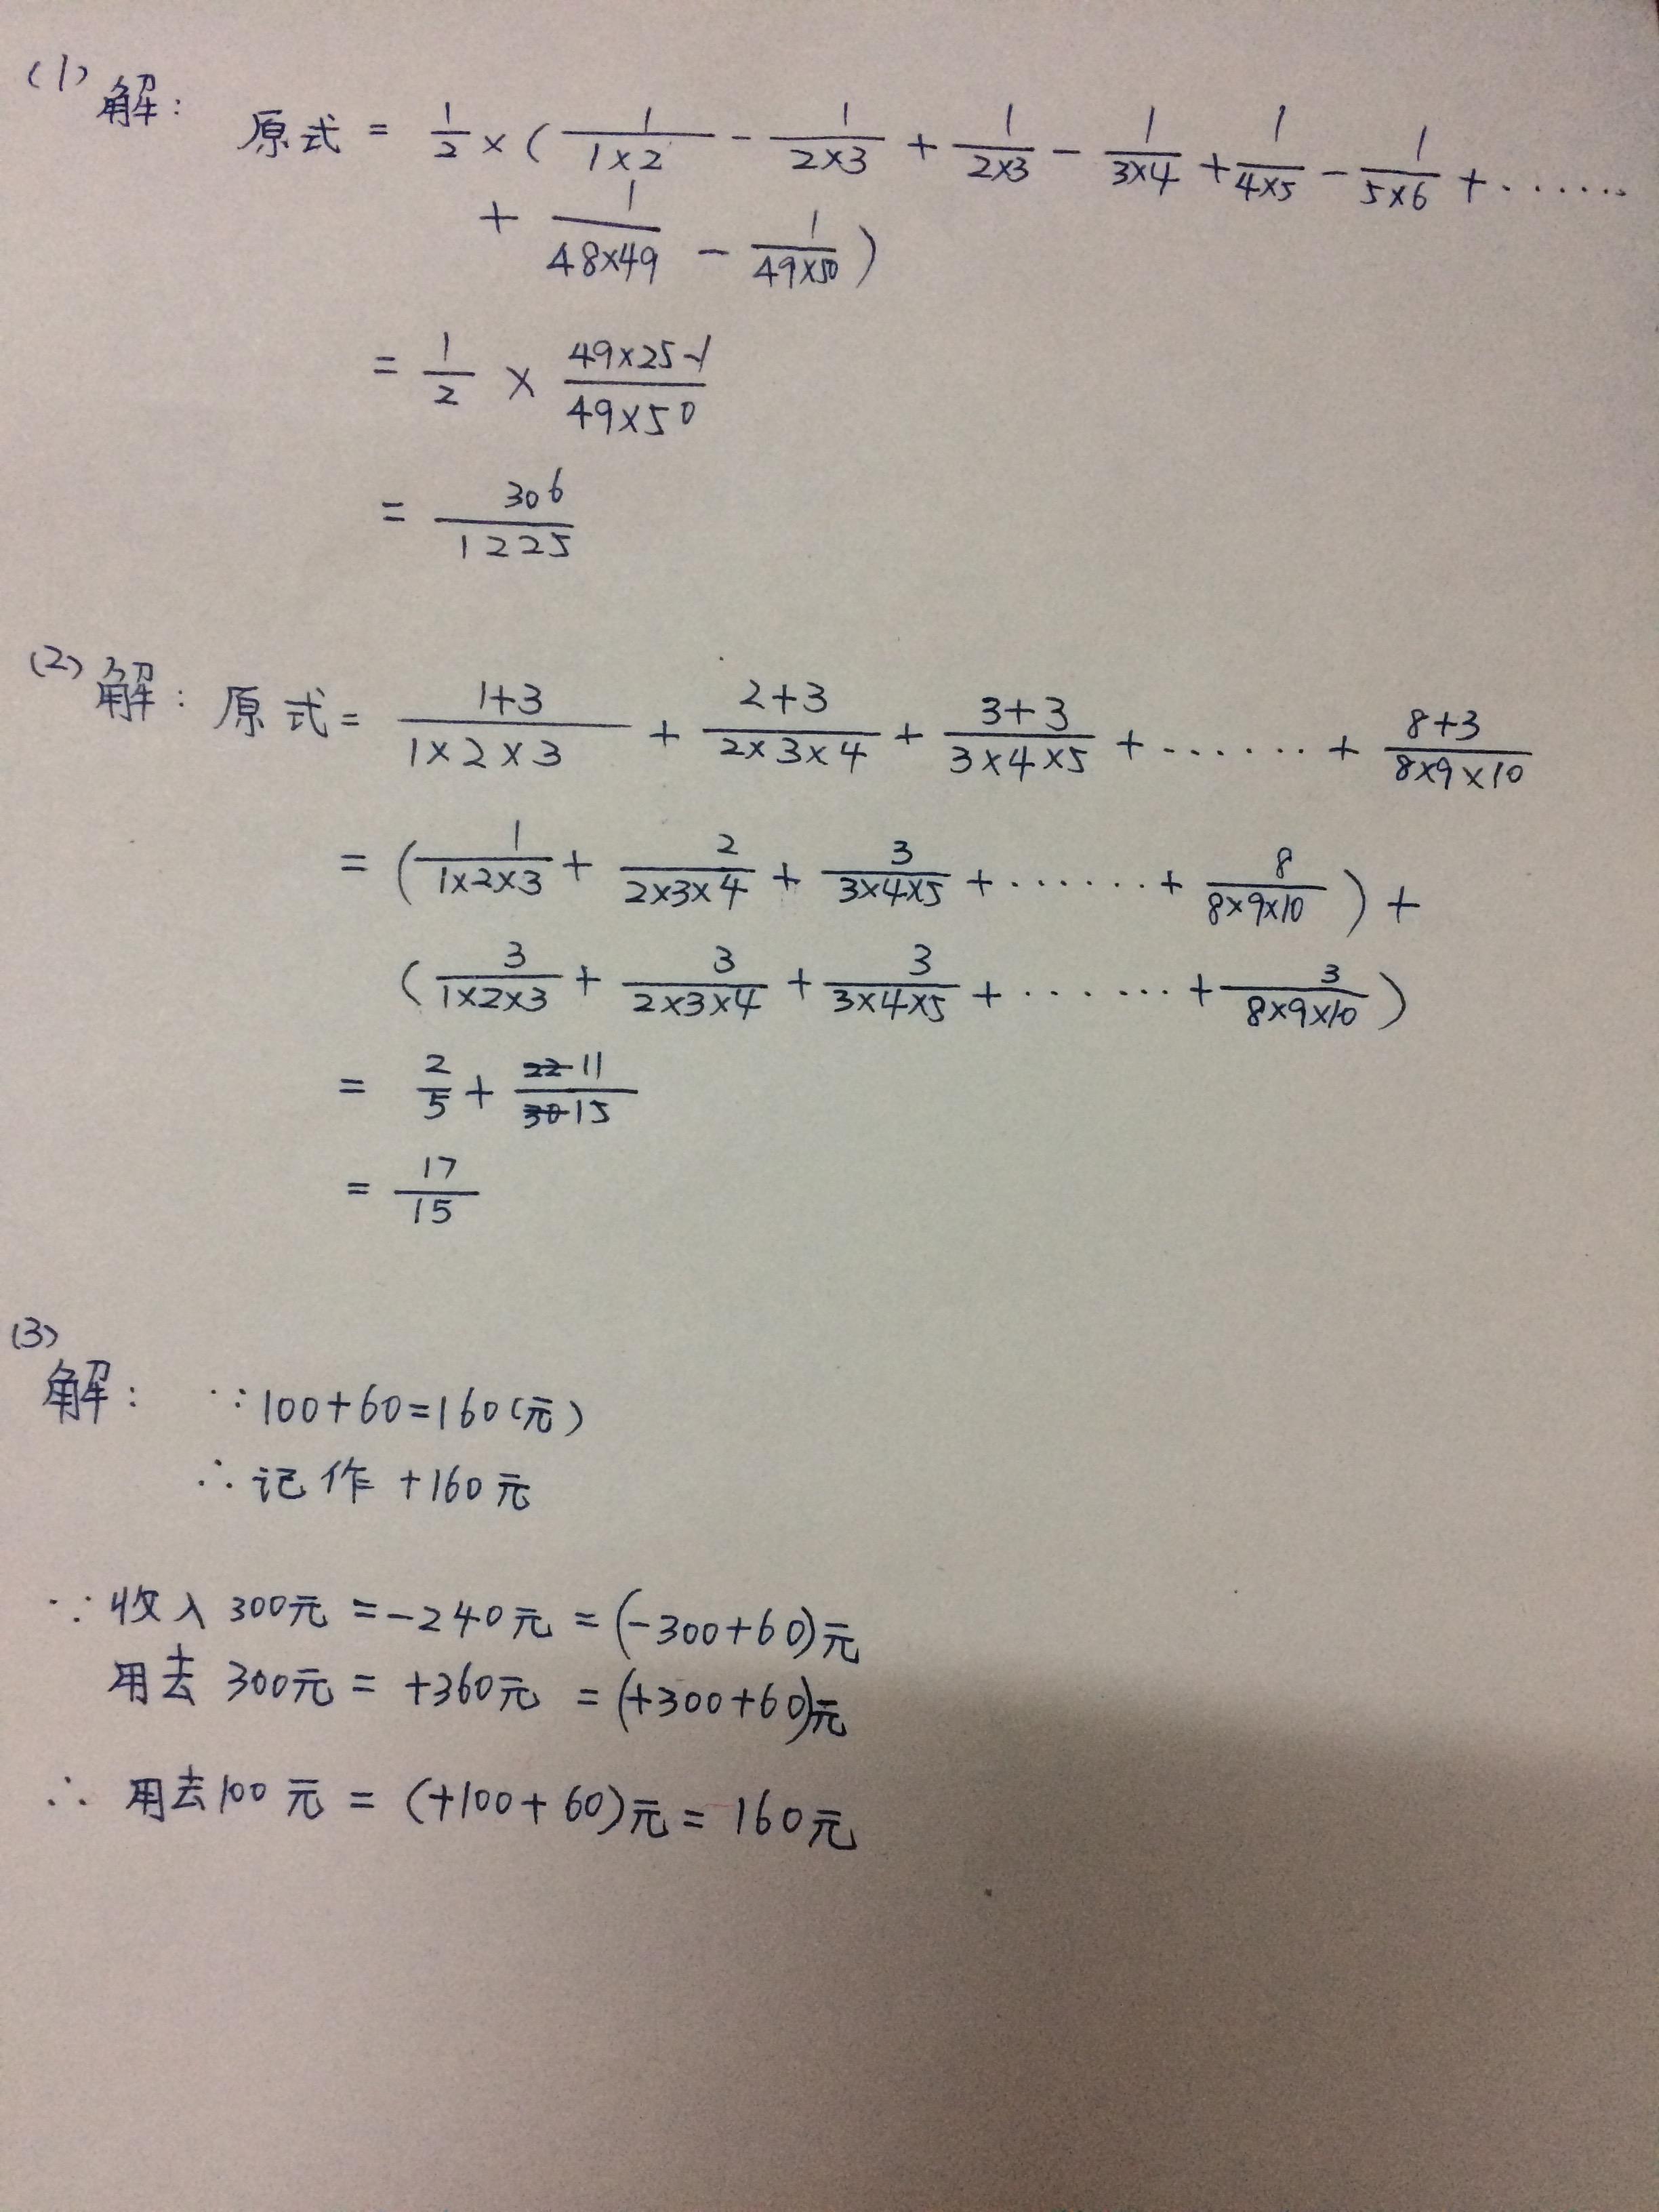 2CDA848F-57CD-41A7-8236-13534AD07917.jpg